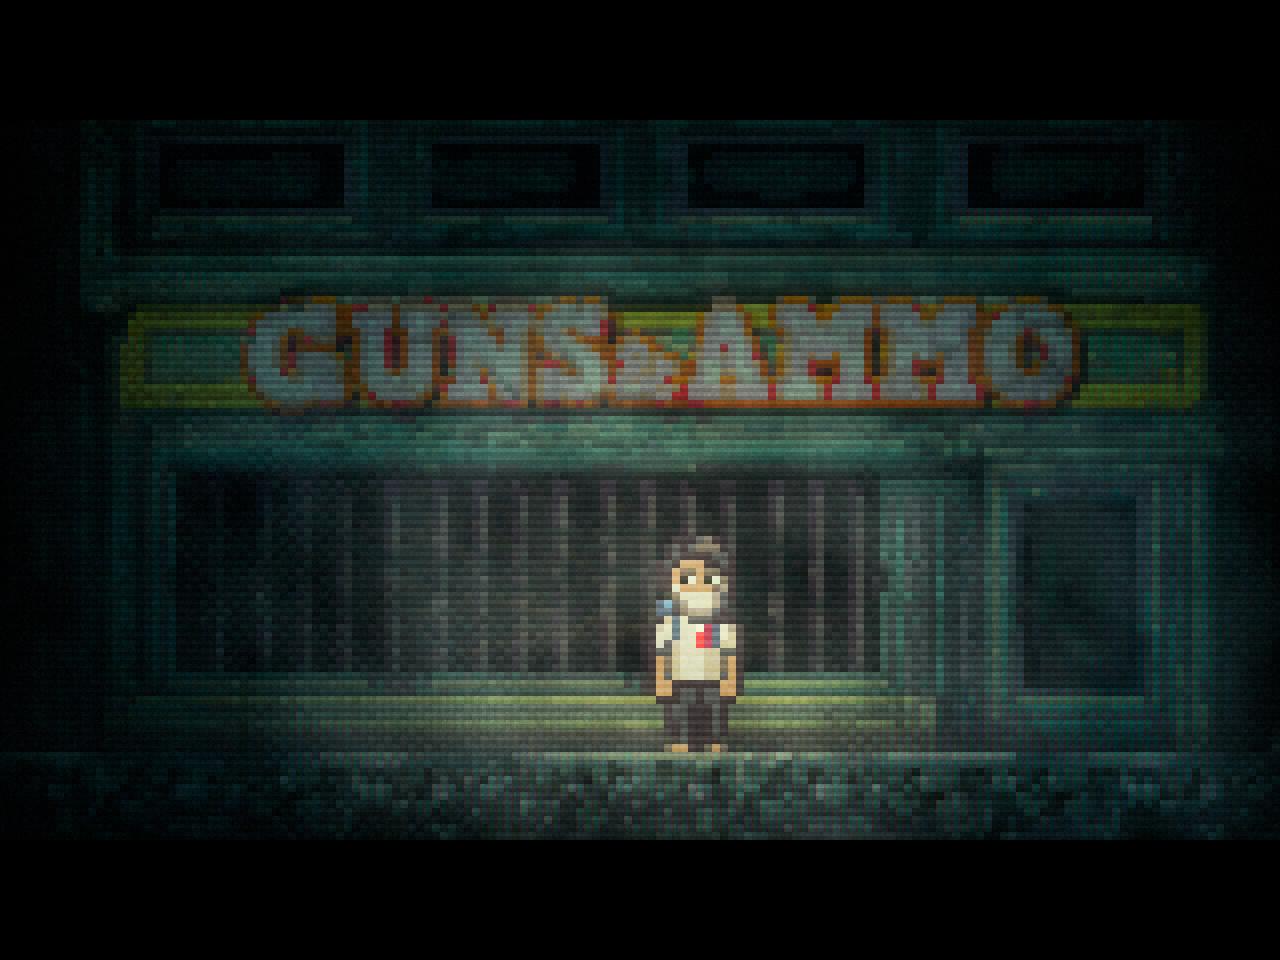 A screenshot of Lone Survivor